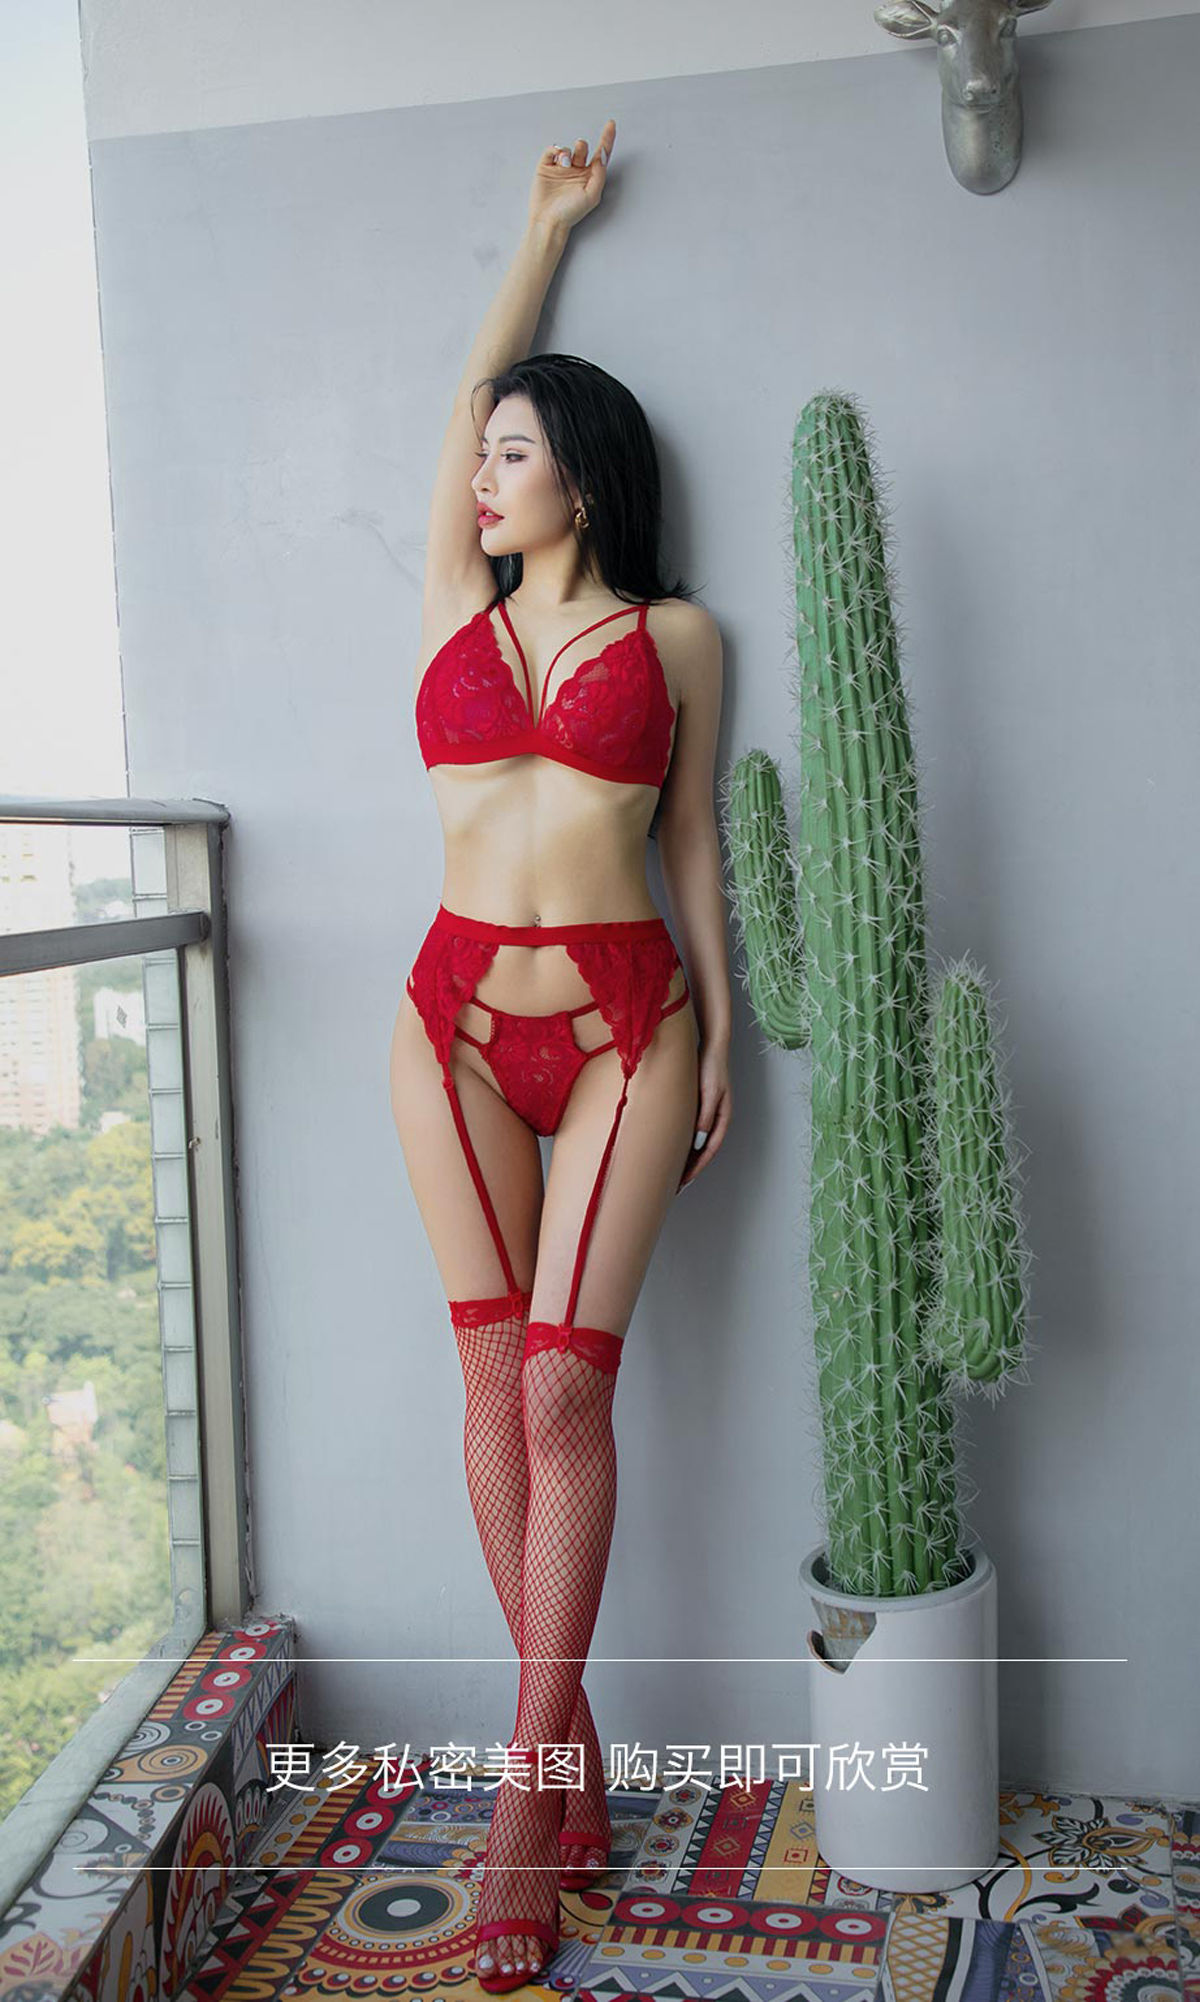 VOL.1656 [尤果圈爱尤物]红色丝袜情趣丝袜:Jenny超高清写真套图(35P)